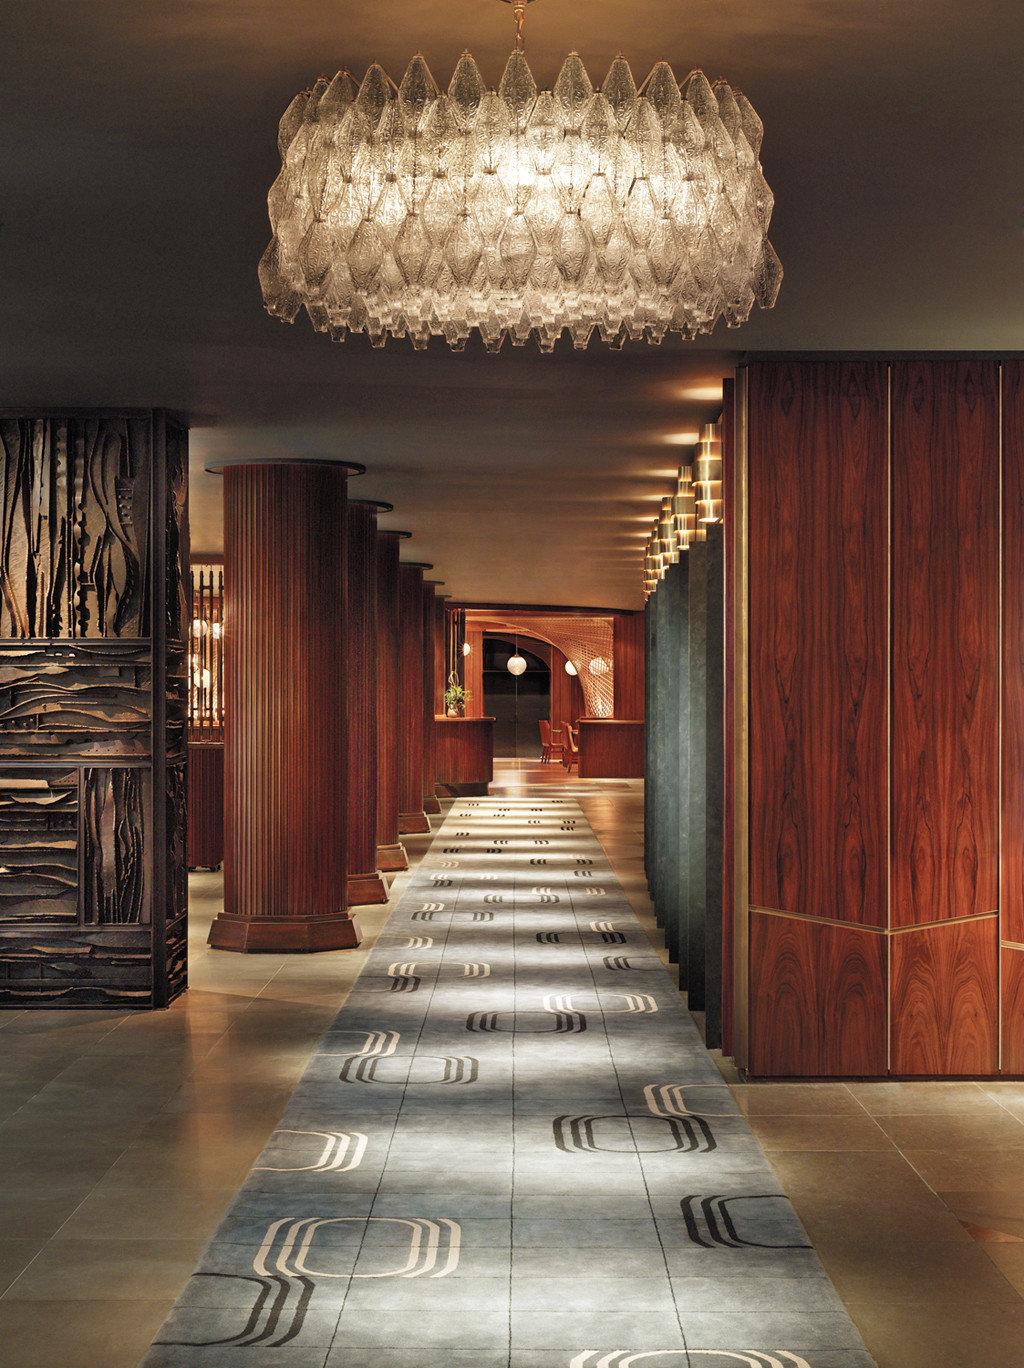 Boutique City Lobby Luxury lighting hall living room flooring aisle mansion ballroom stone